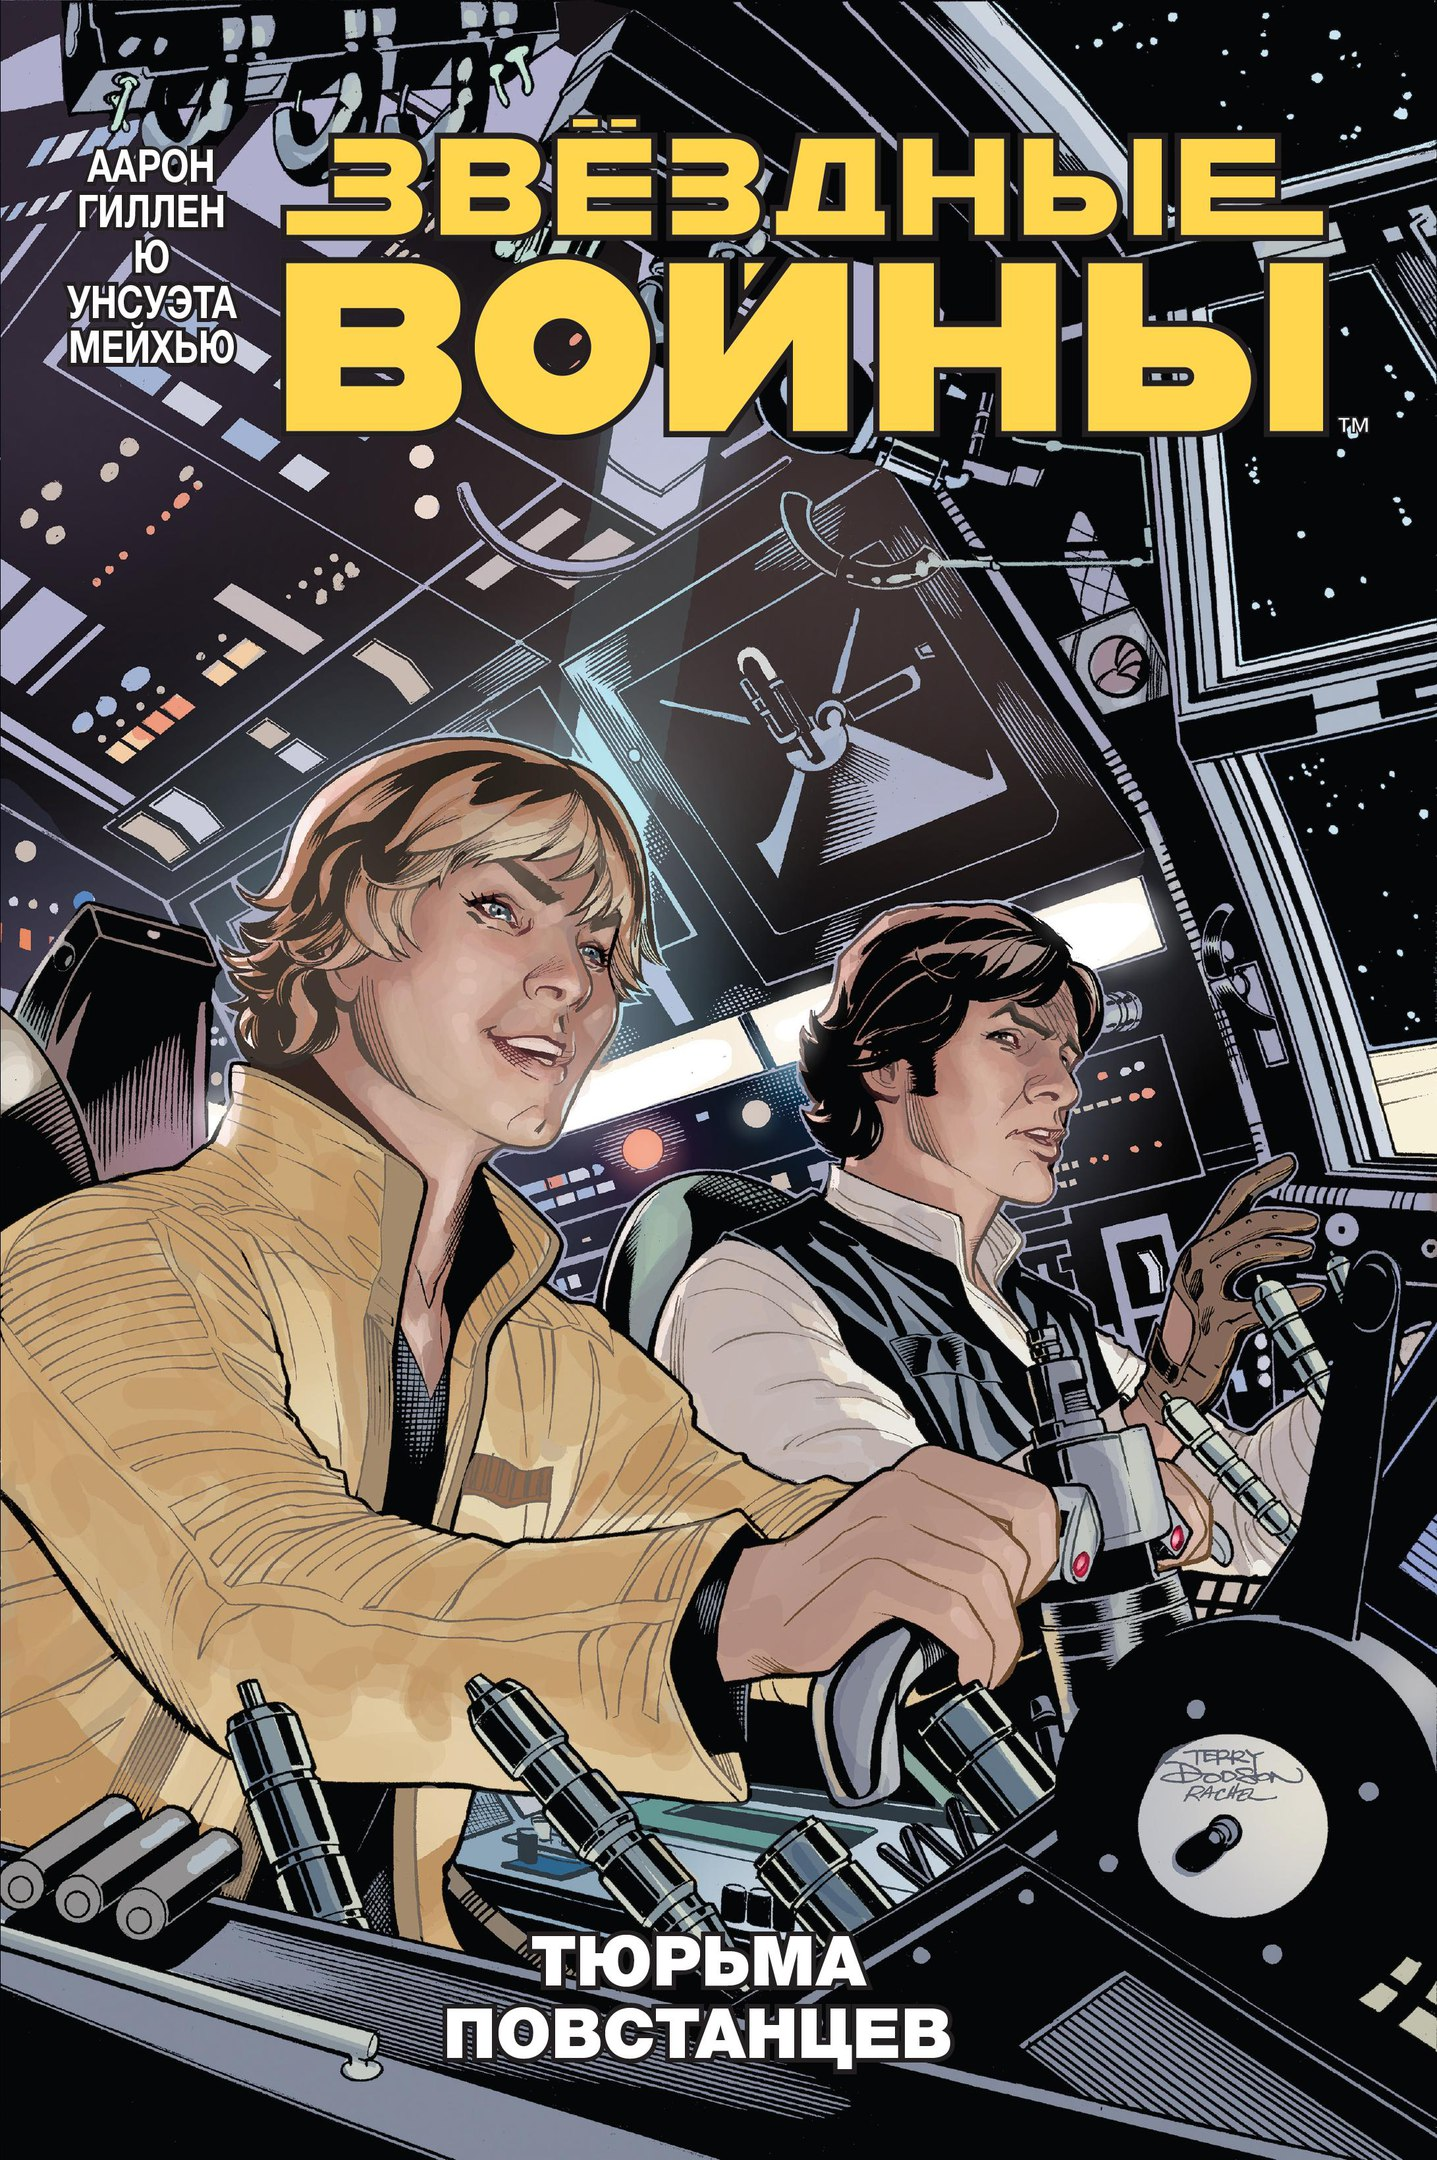 Звёздные войны: Выпуск 3 — Тюрьма повстанцев